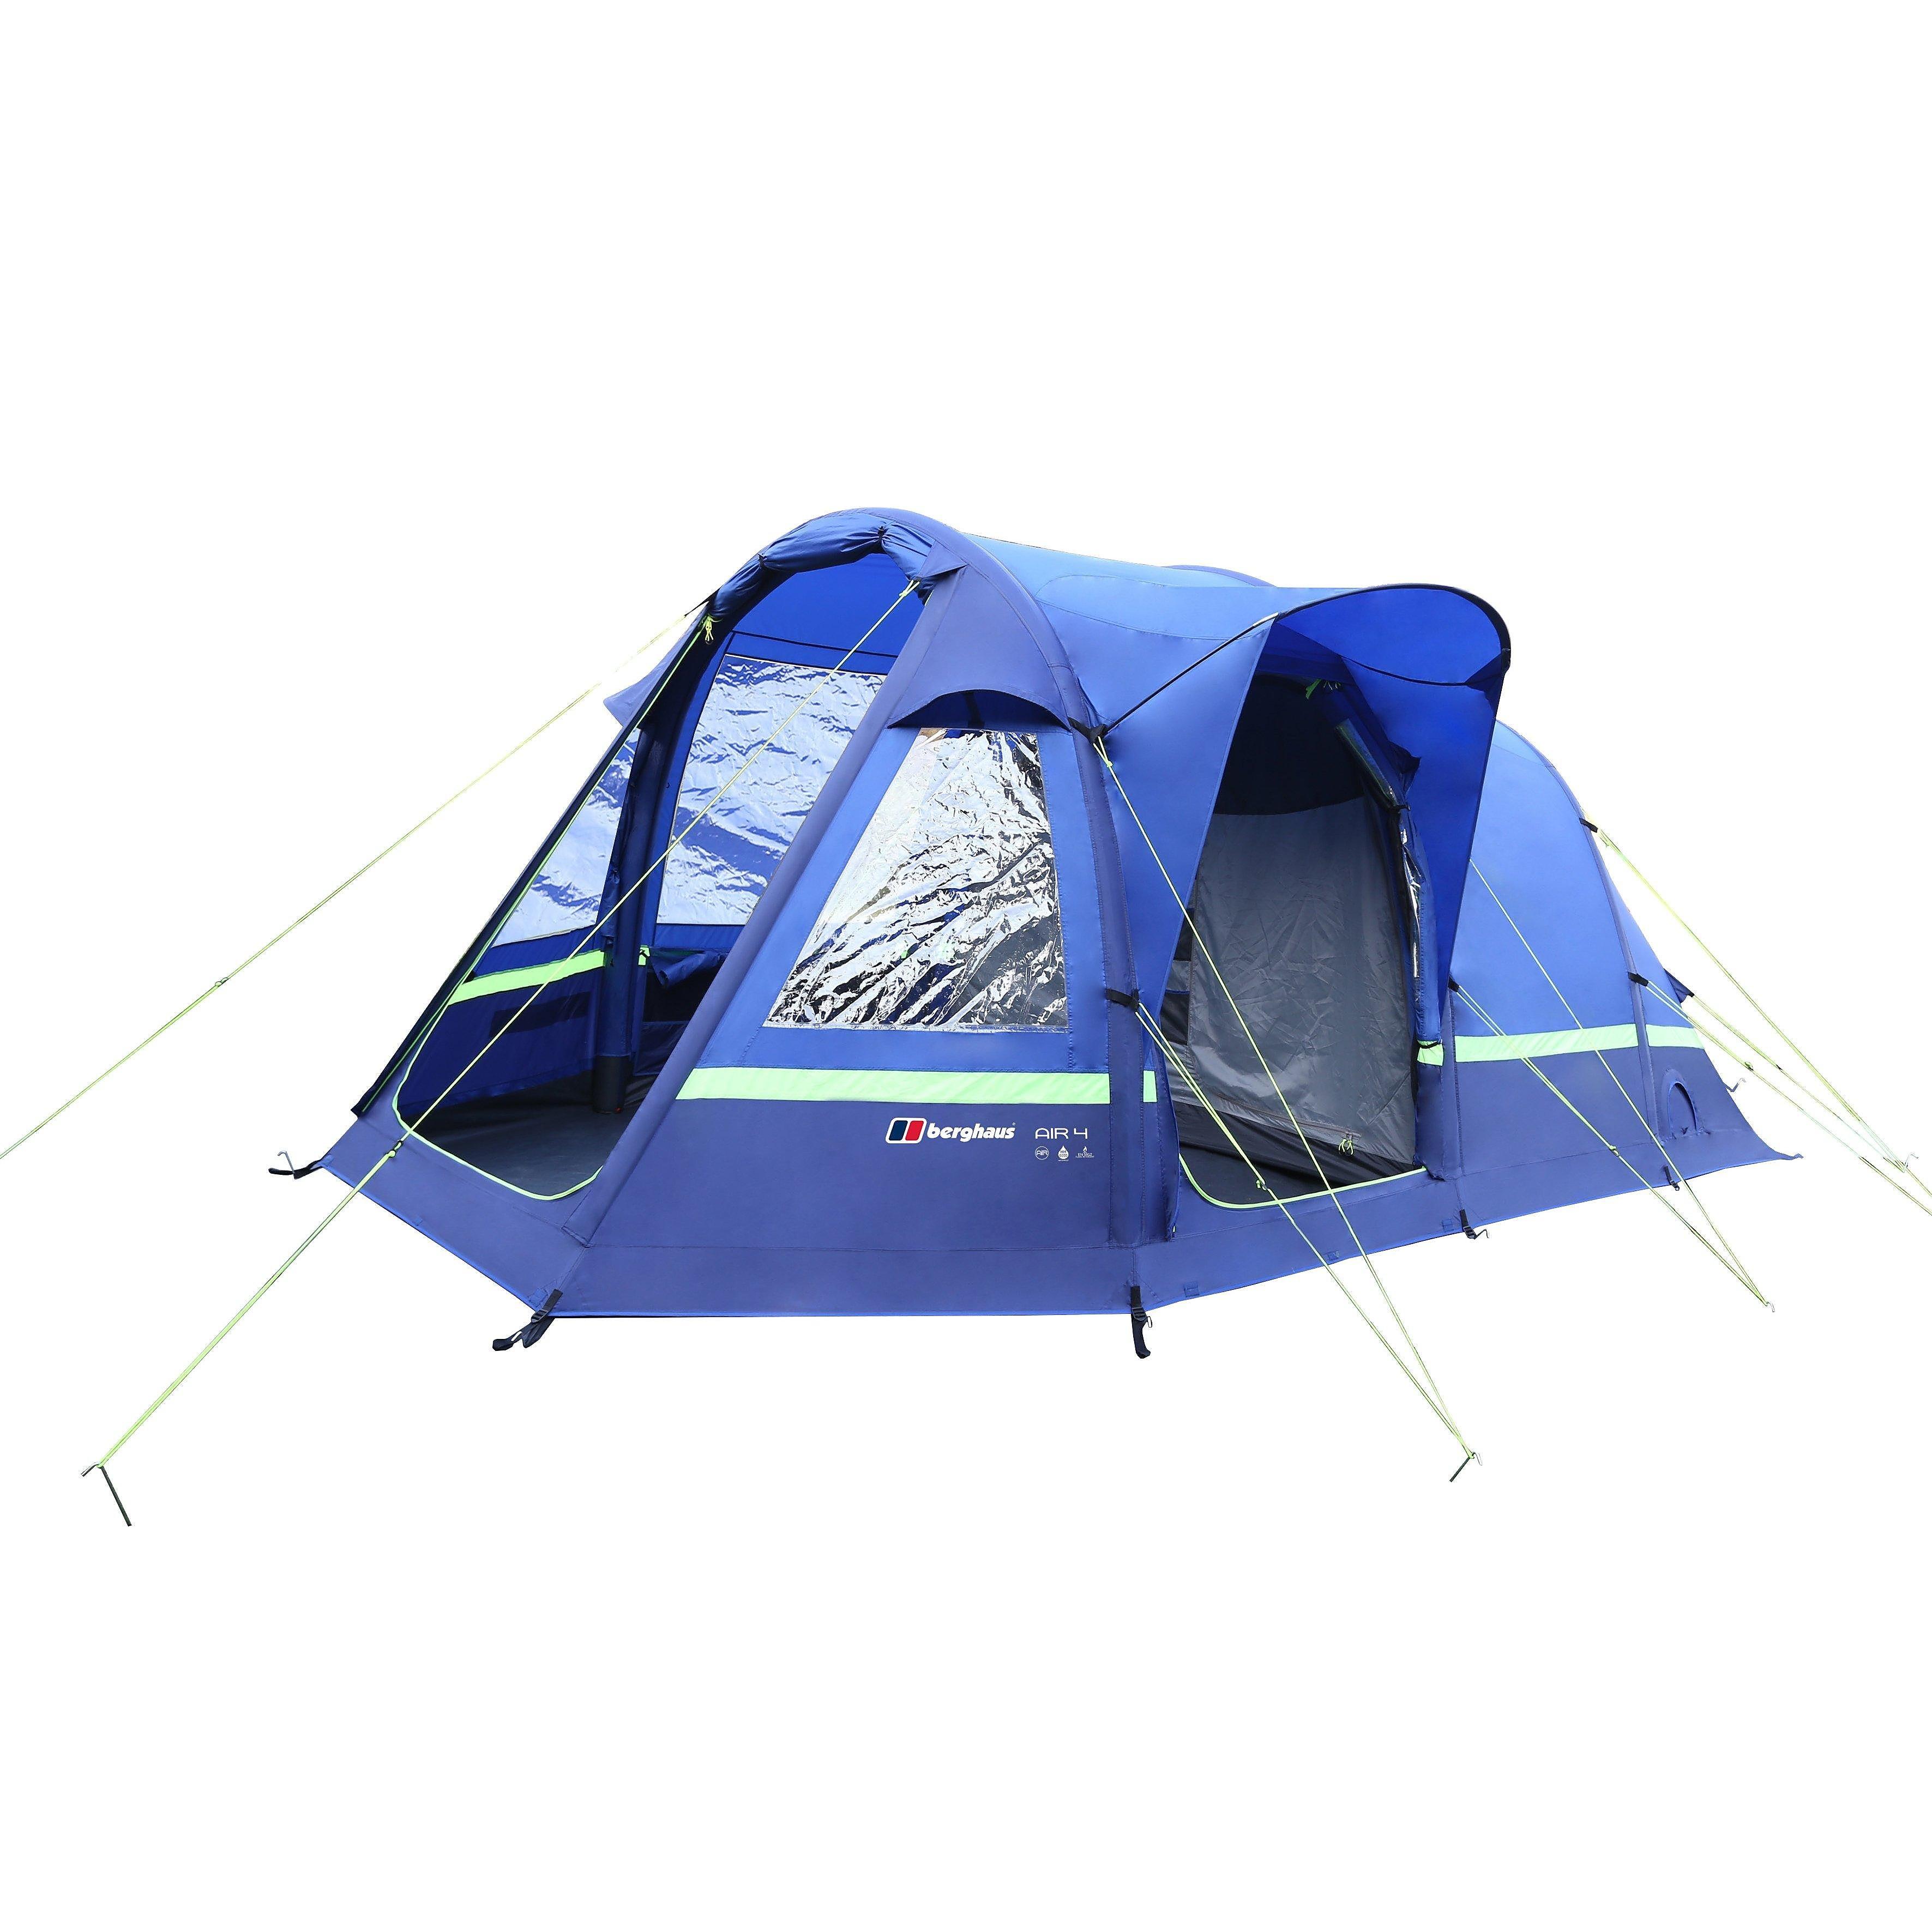 Berghaus Air 4 Inflatable Tent